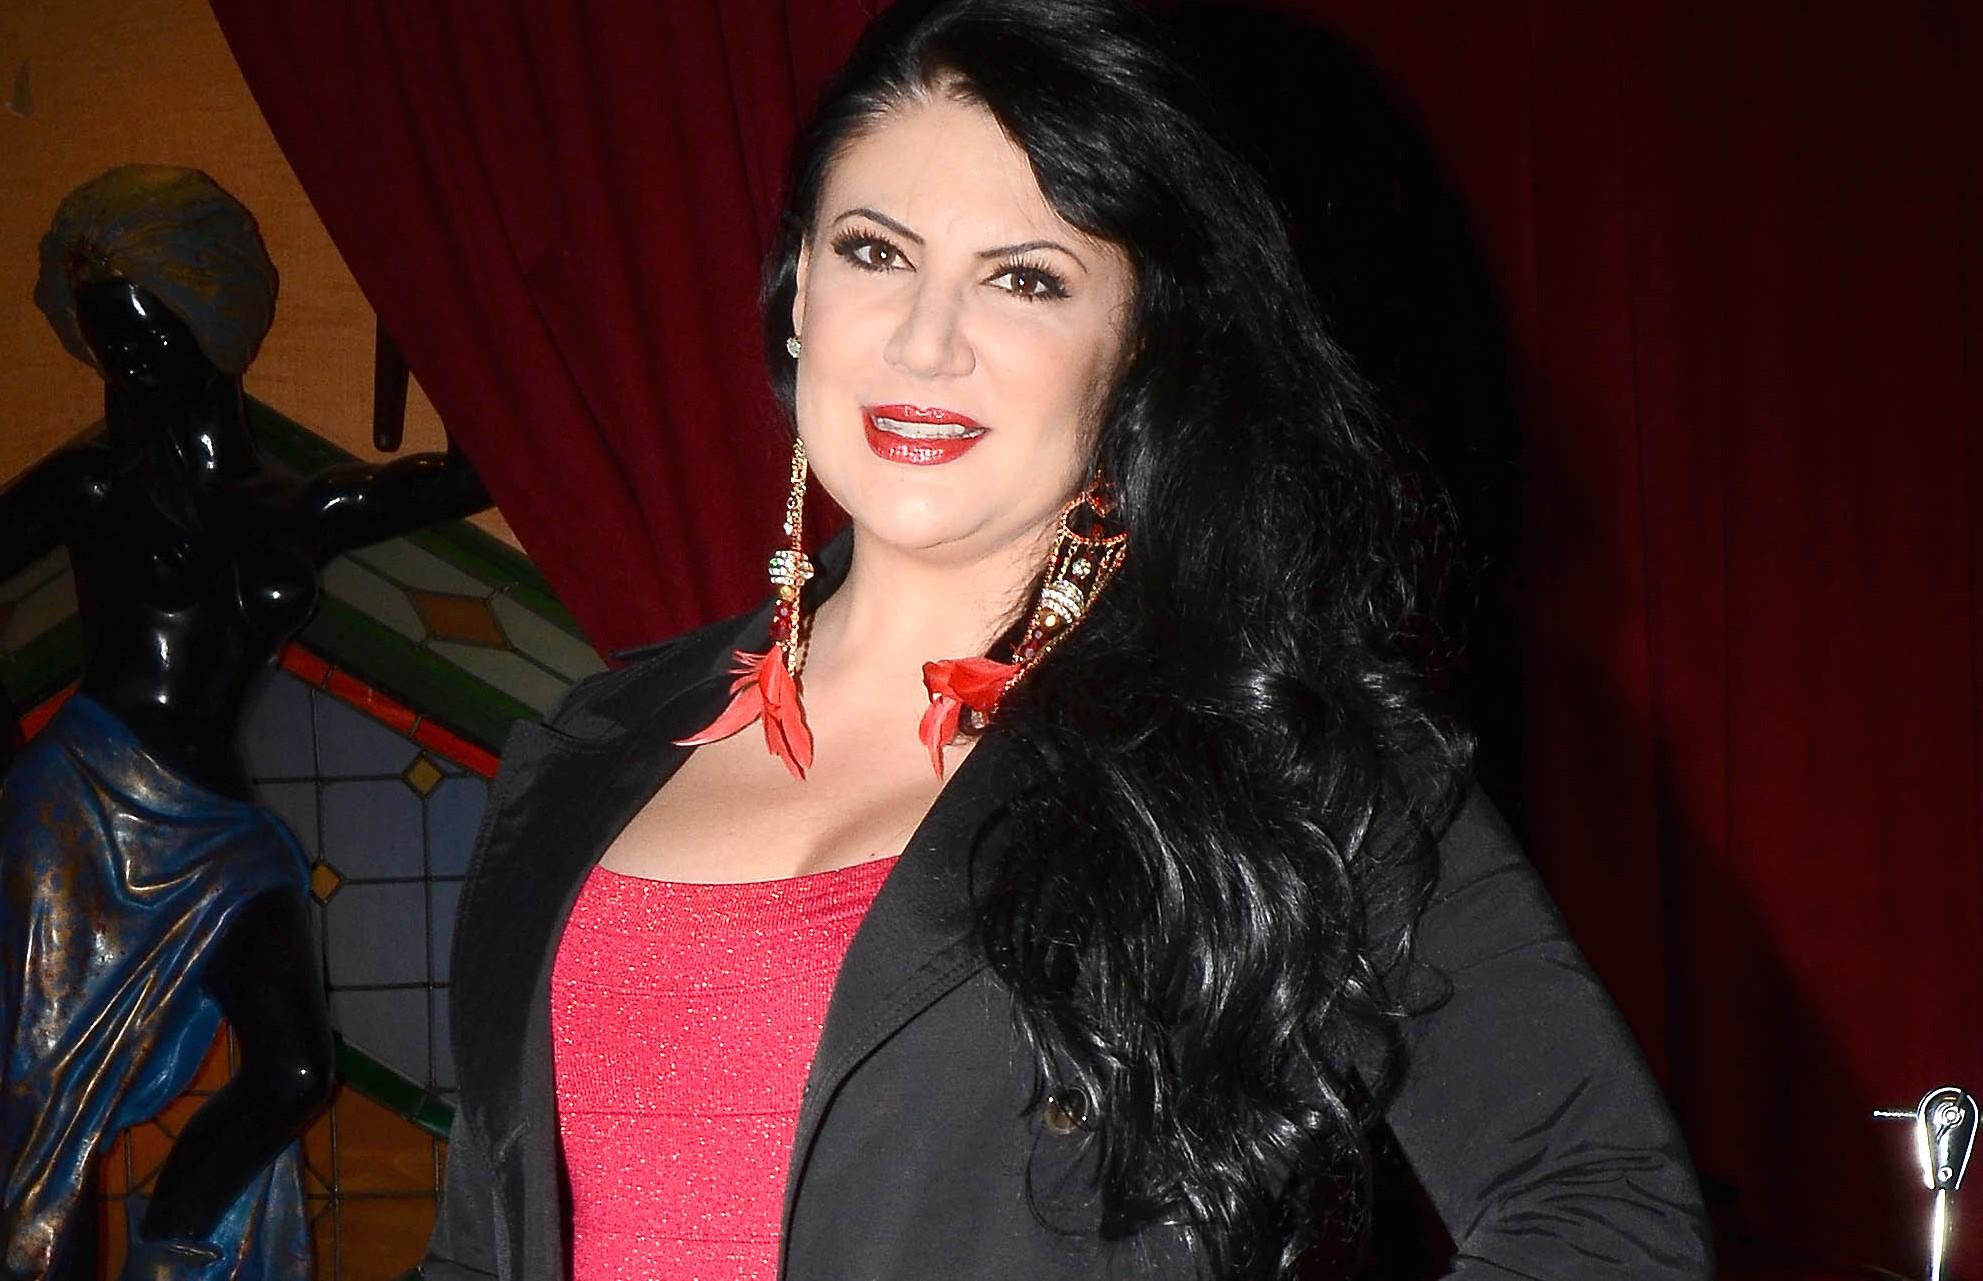 Actriz de Televisa confirma existencia de 'catálogo sexual', pagaban 1 mdp por noche